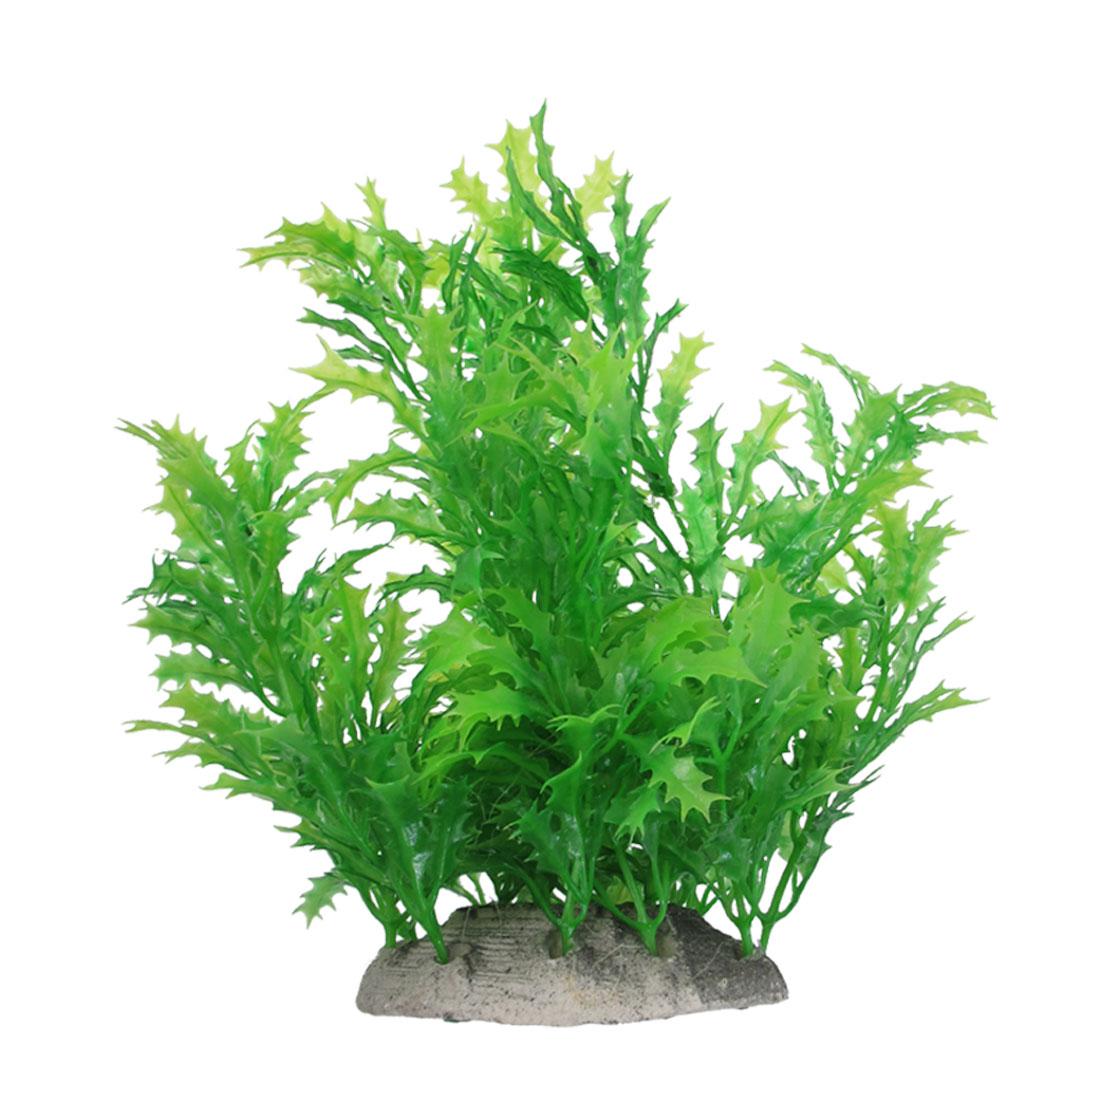 "7.1"" Height Green Manmade Aquarium Plastic Plant for Fish Tank"